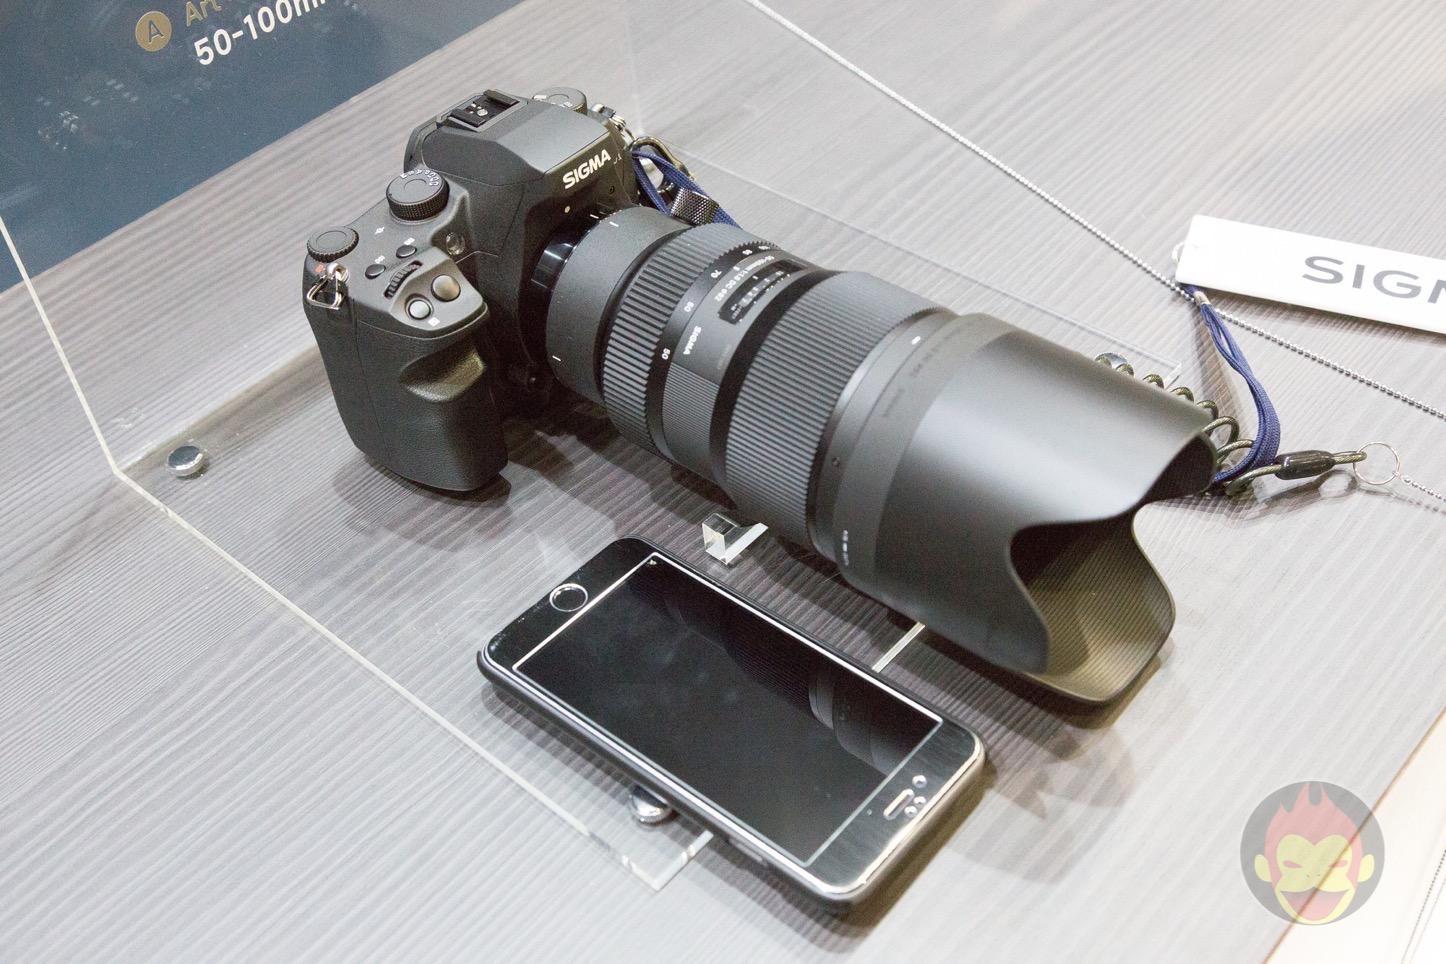 SIGMA 50-100mm F1.8 DC HSM